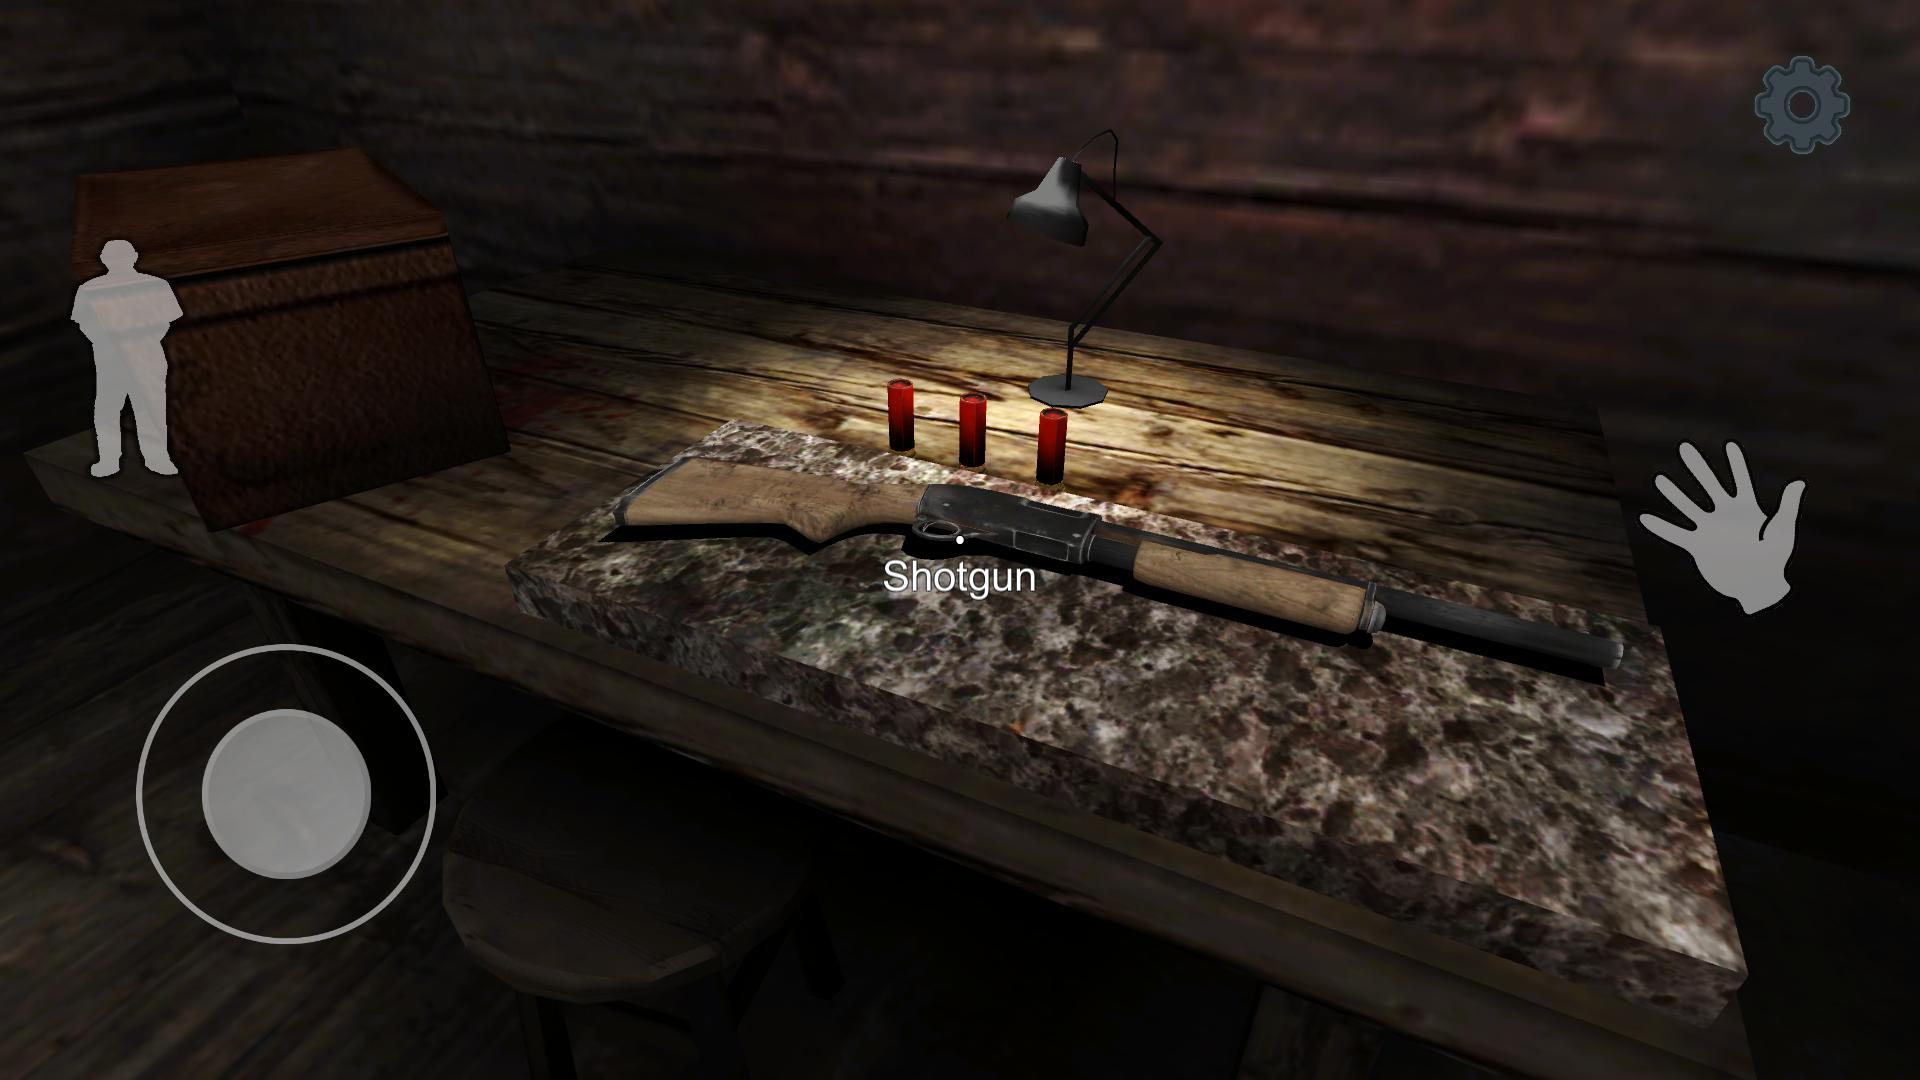 Evil Kid The Horror Game 1.1.9.5.4.4 Screenshot 2